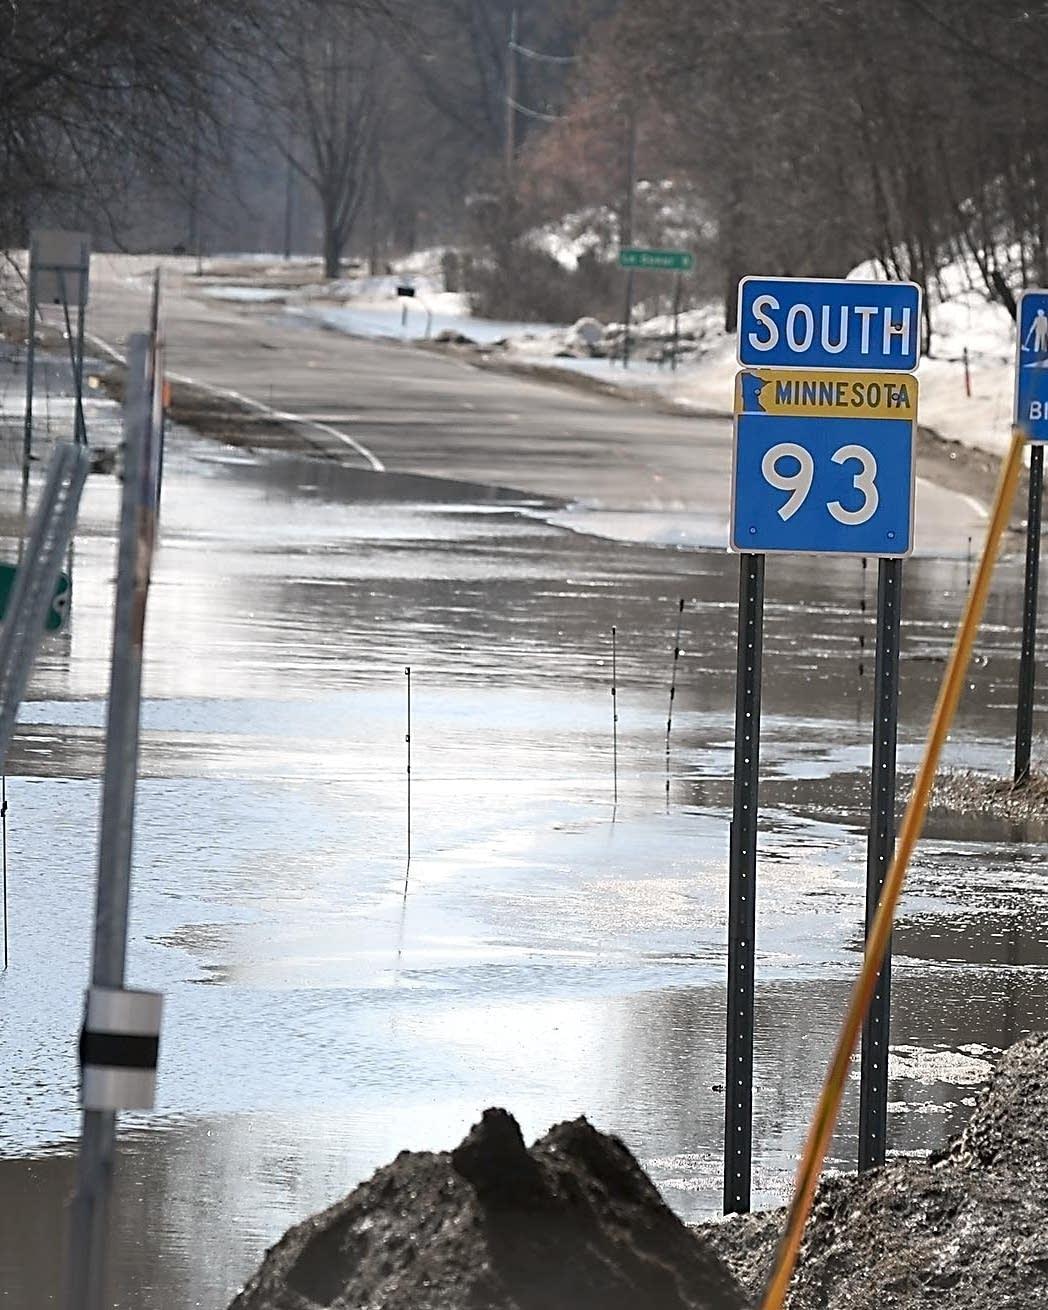 Midweek rains bring second crest on southern Minn  rivers | MPR News